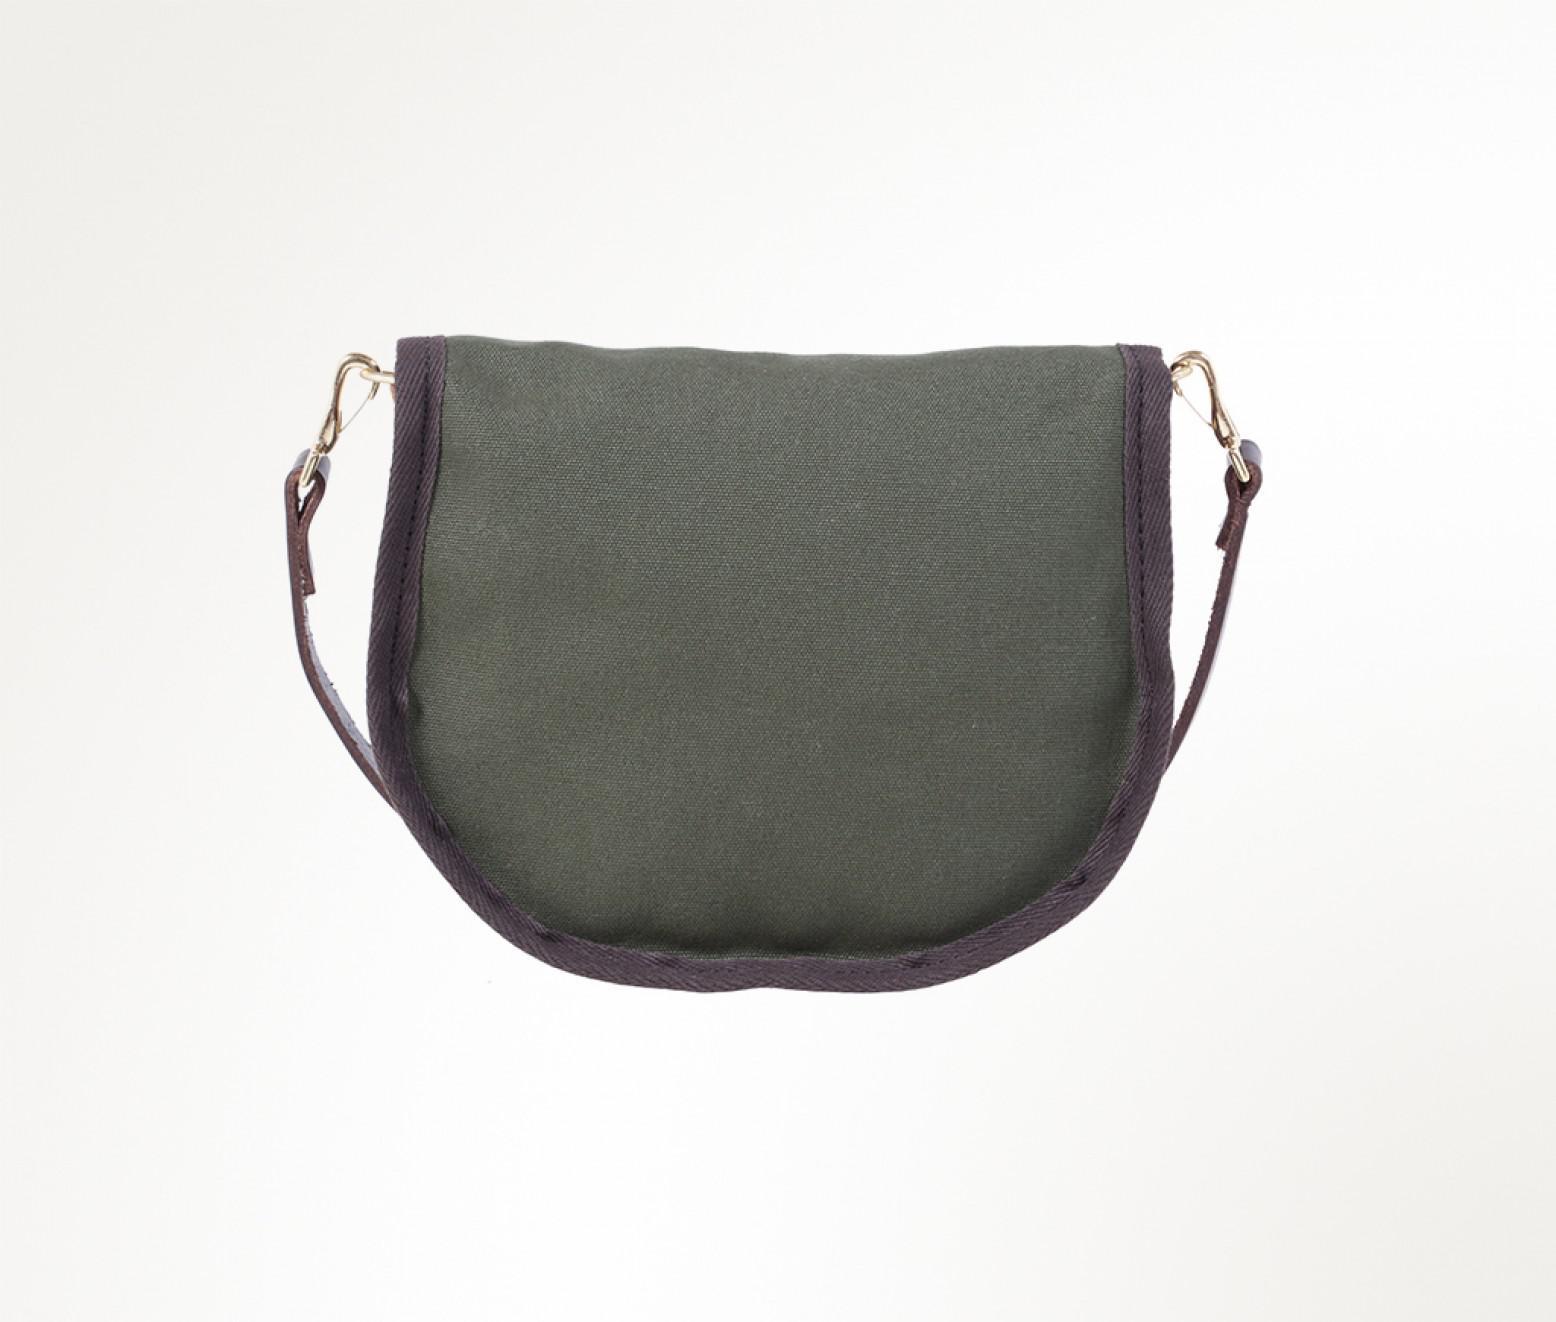 b1117e8b32d Minnetonka X Duluth Pack - Shell Bag - Lyst